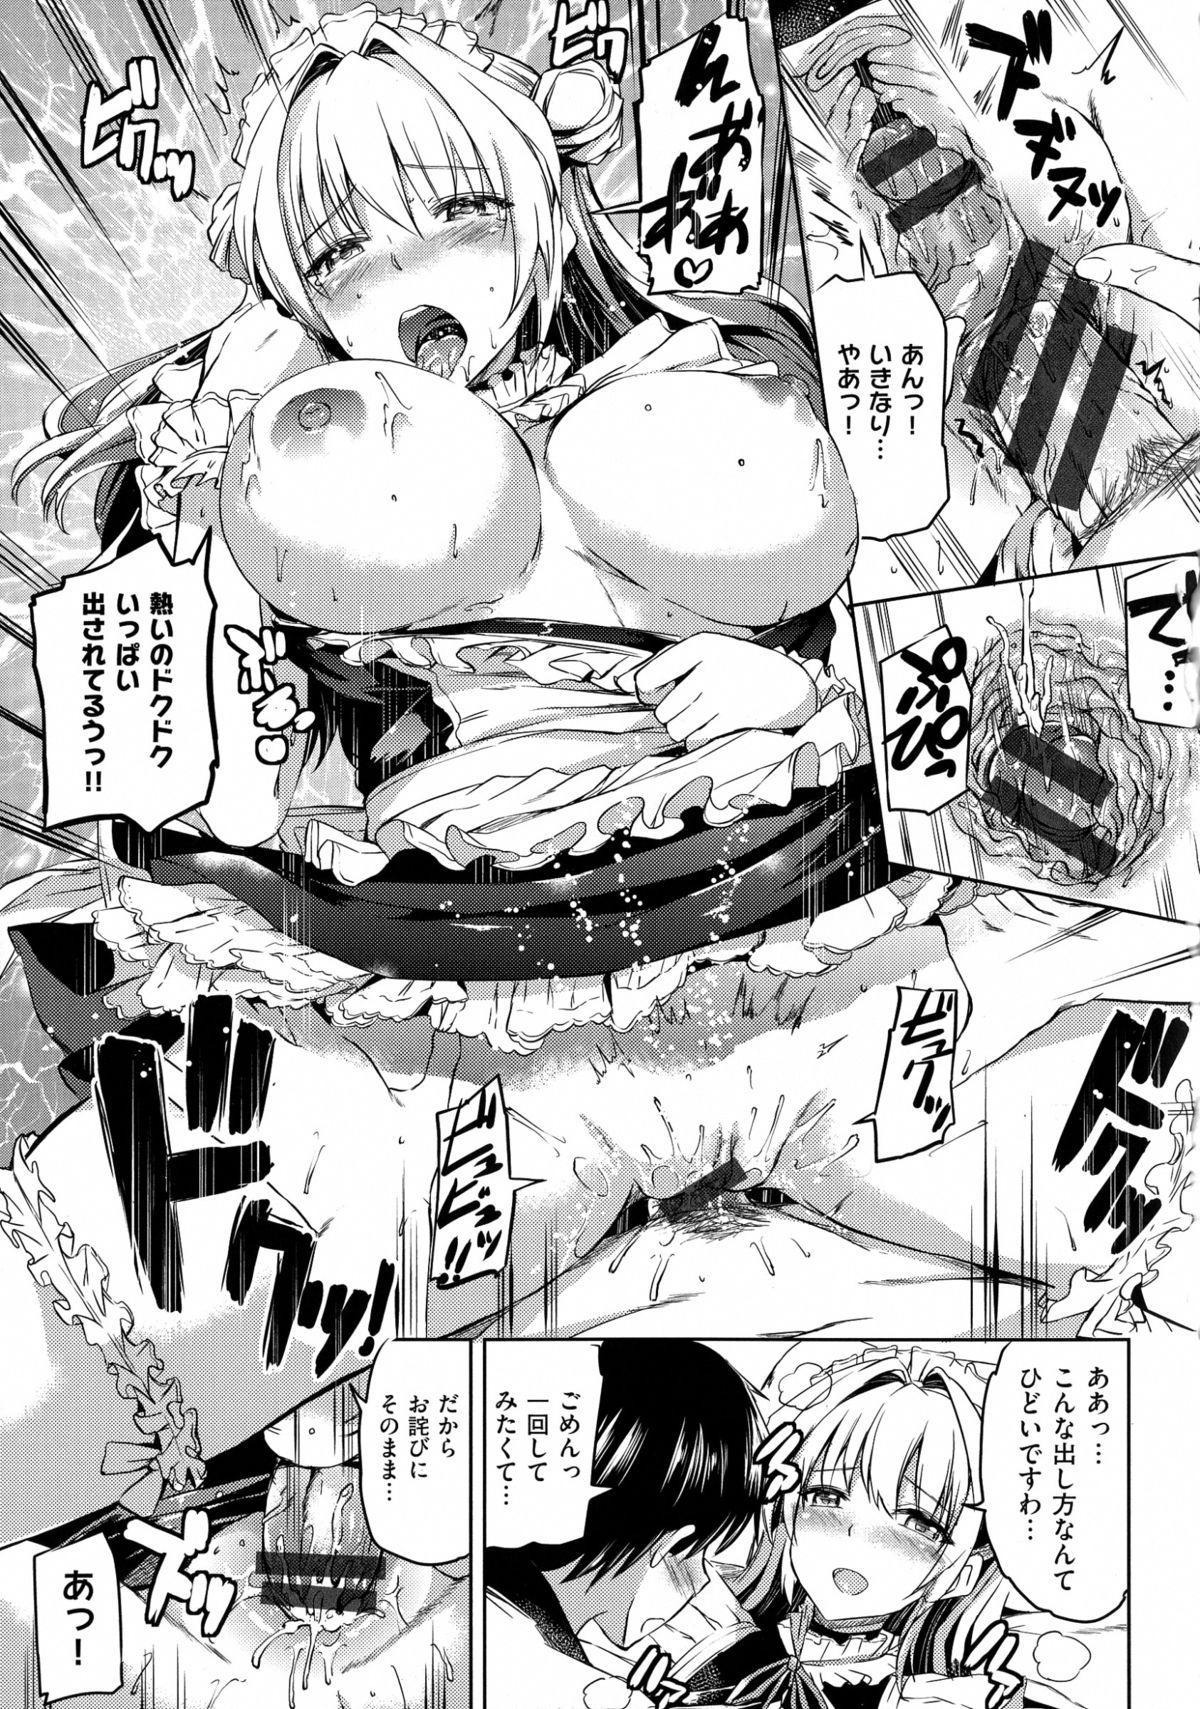 Ojousama no Maid Jijou 28